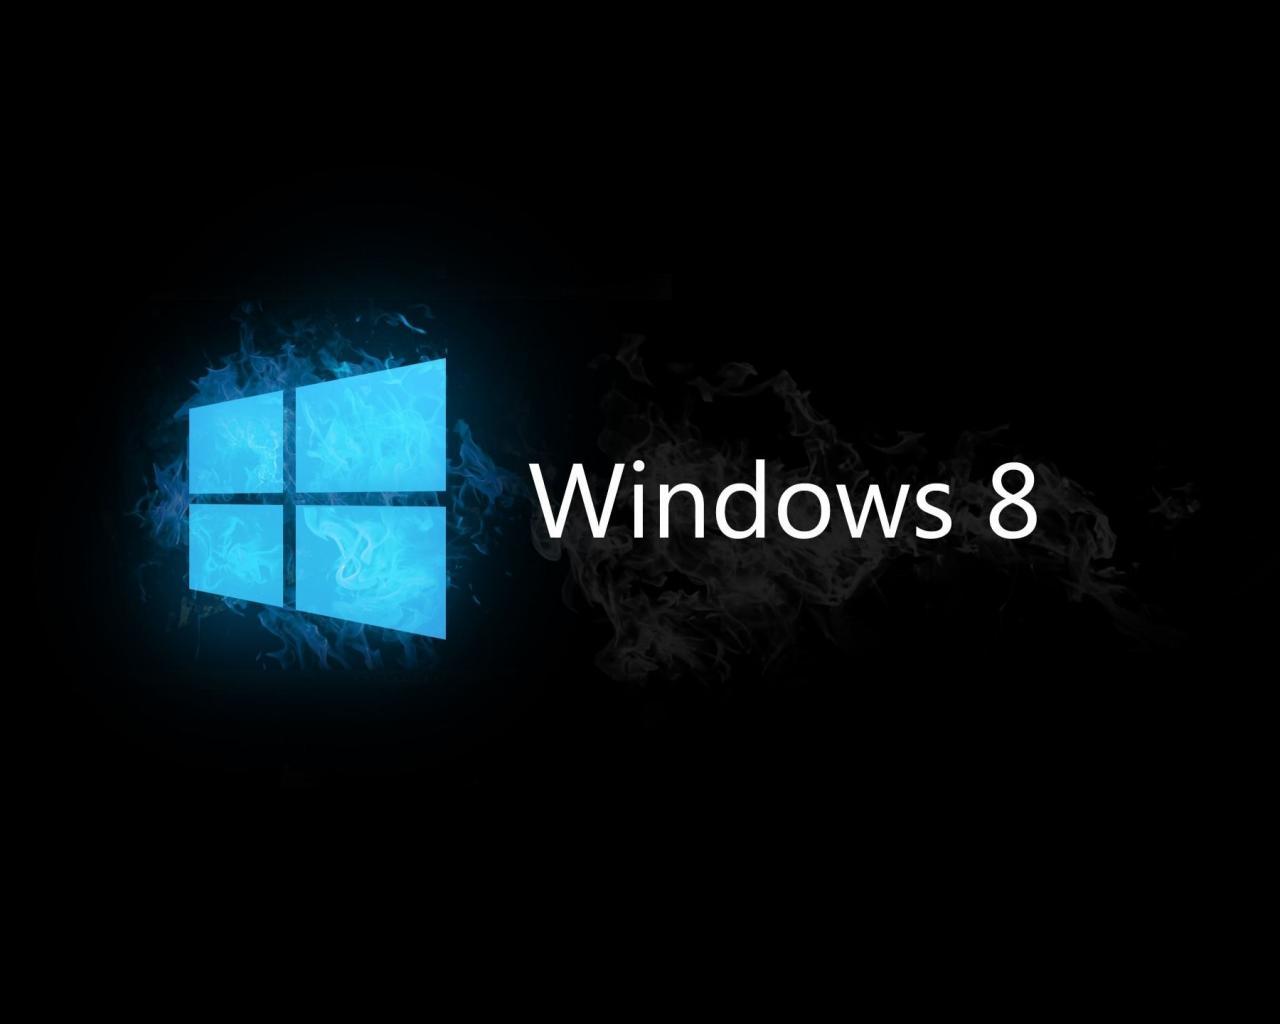 Windows 8 Logo Wallpaper 1280x1024 Download wallpapers page 1280x1024